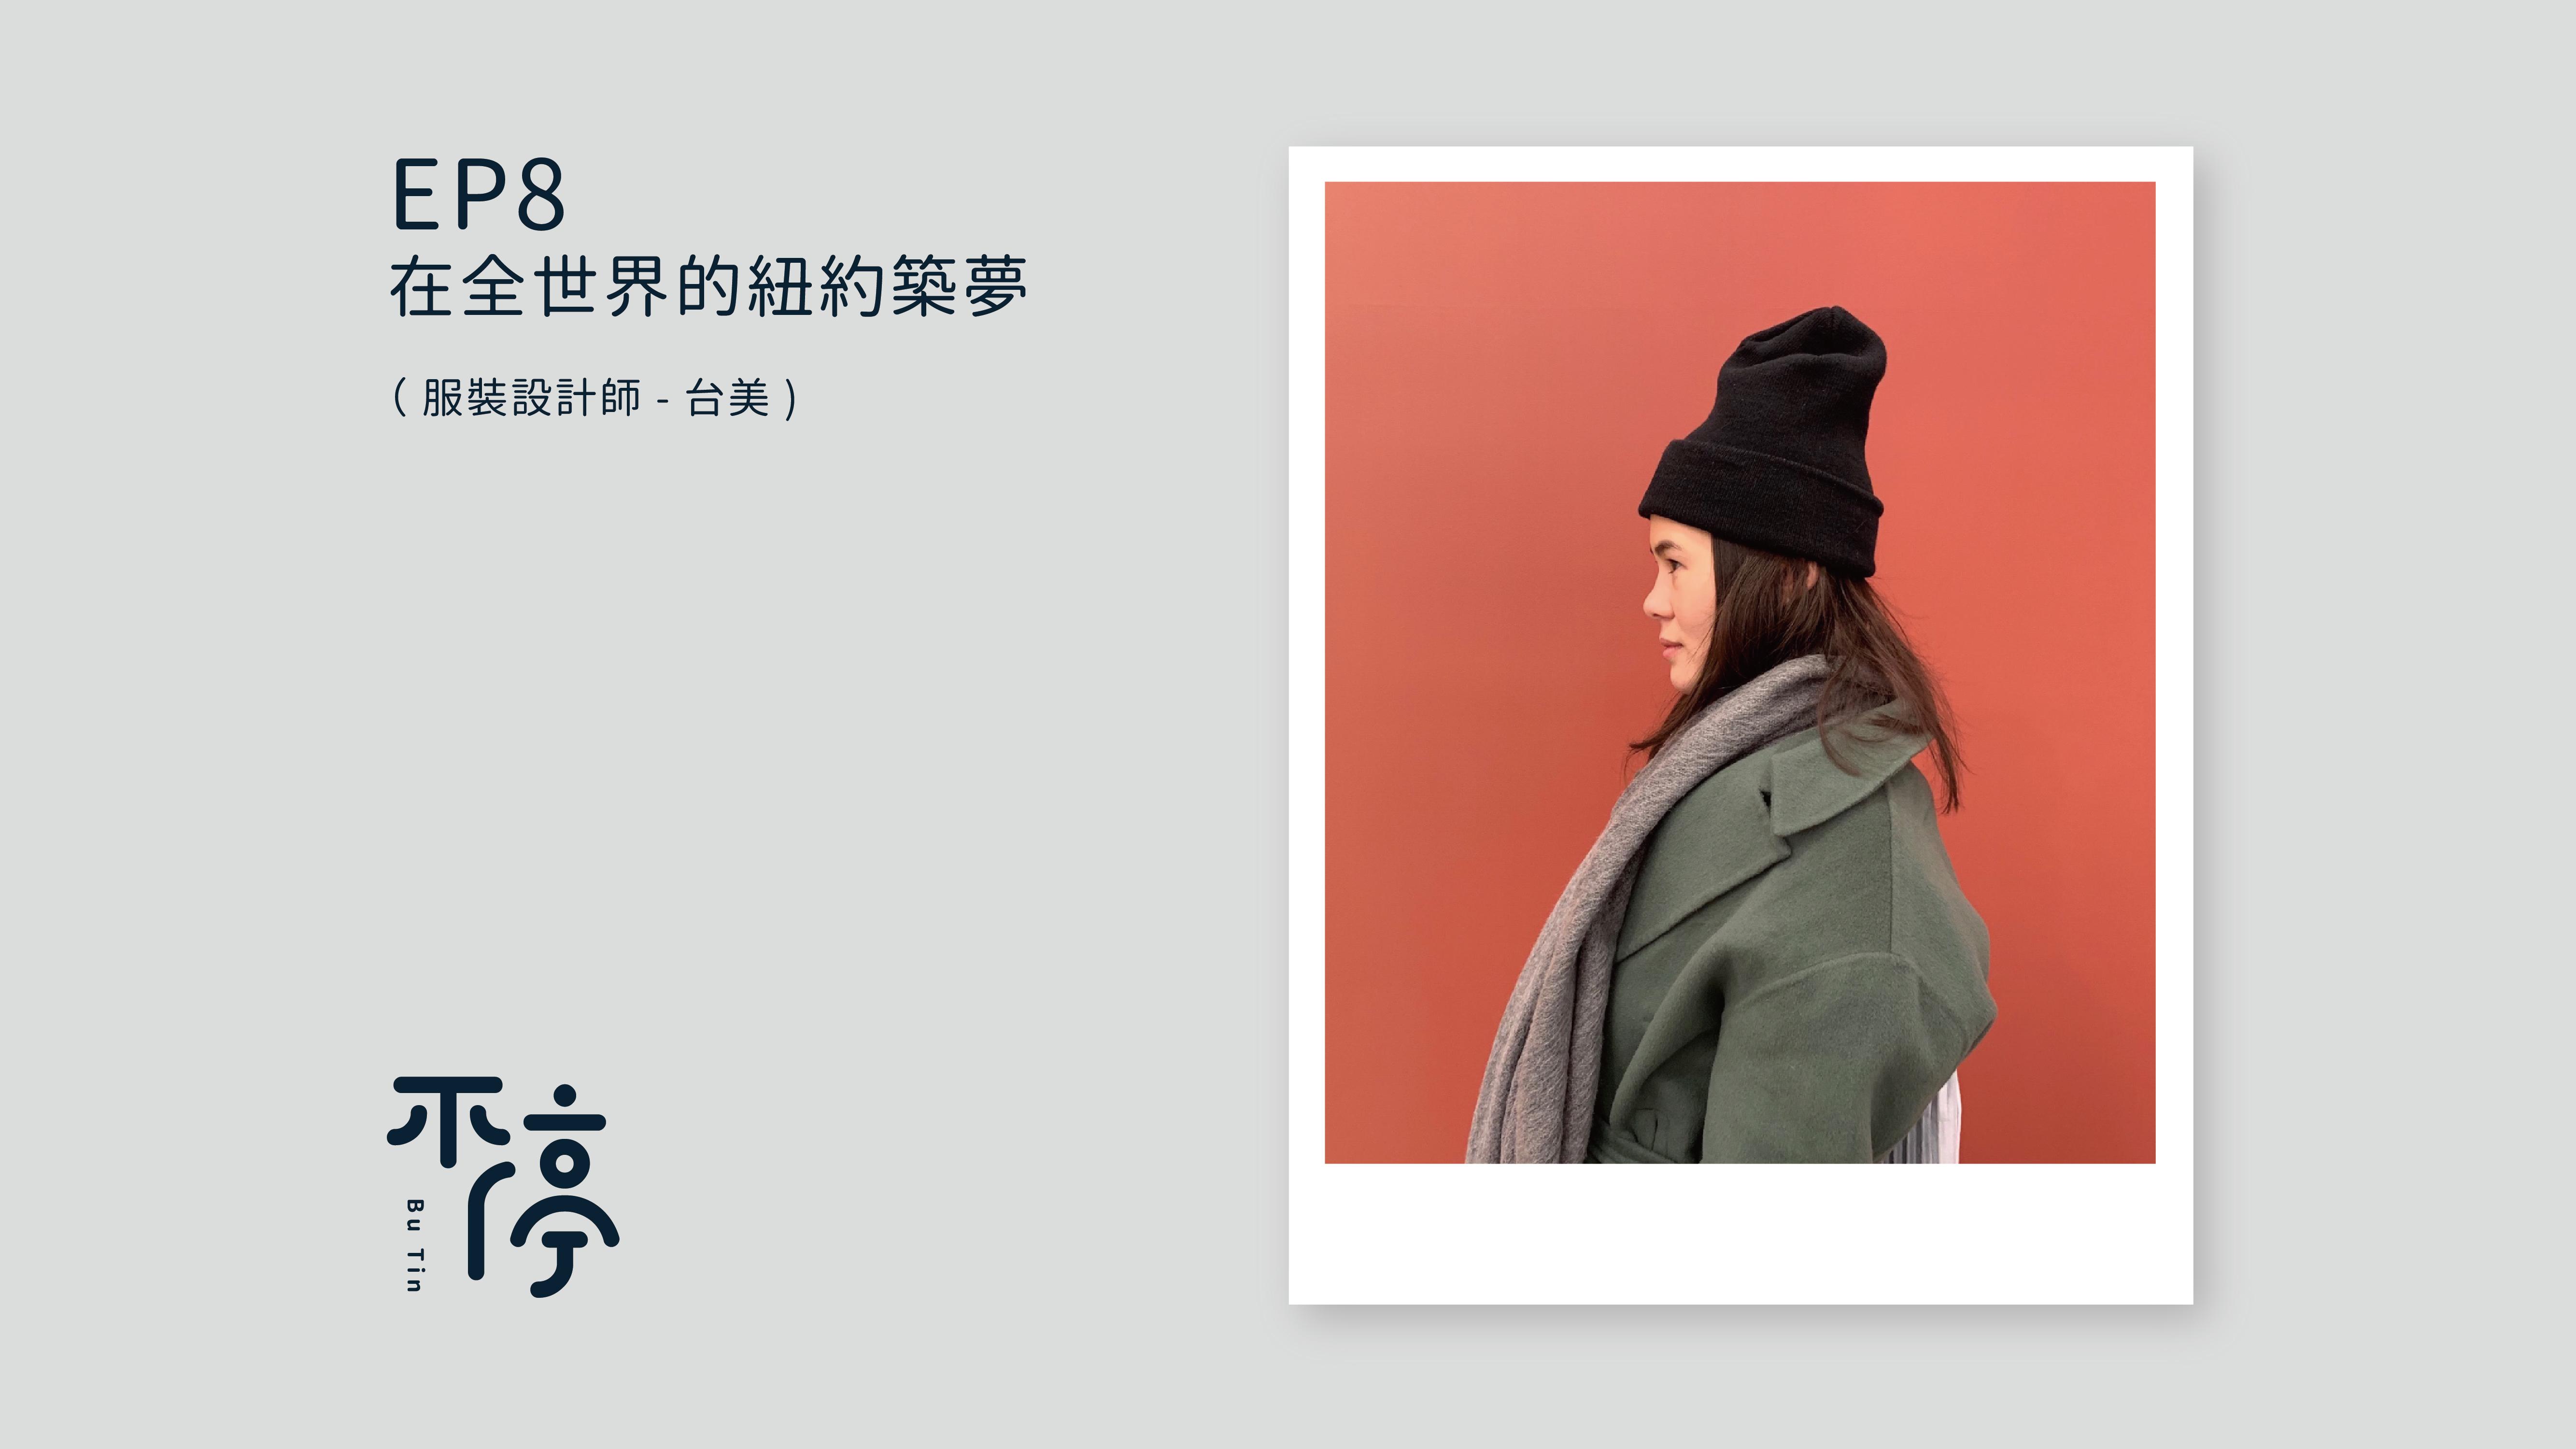 EP8 - 在全世界的紐約築夢( 服裝設計師 - 台美 )